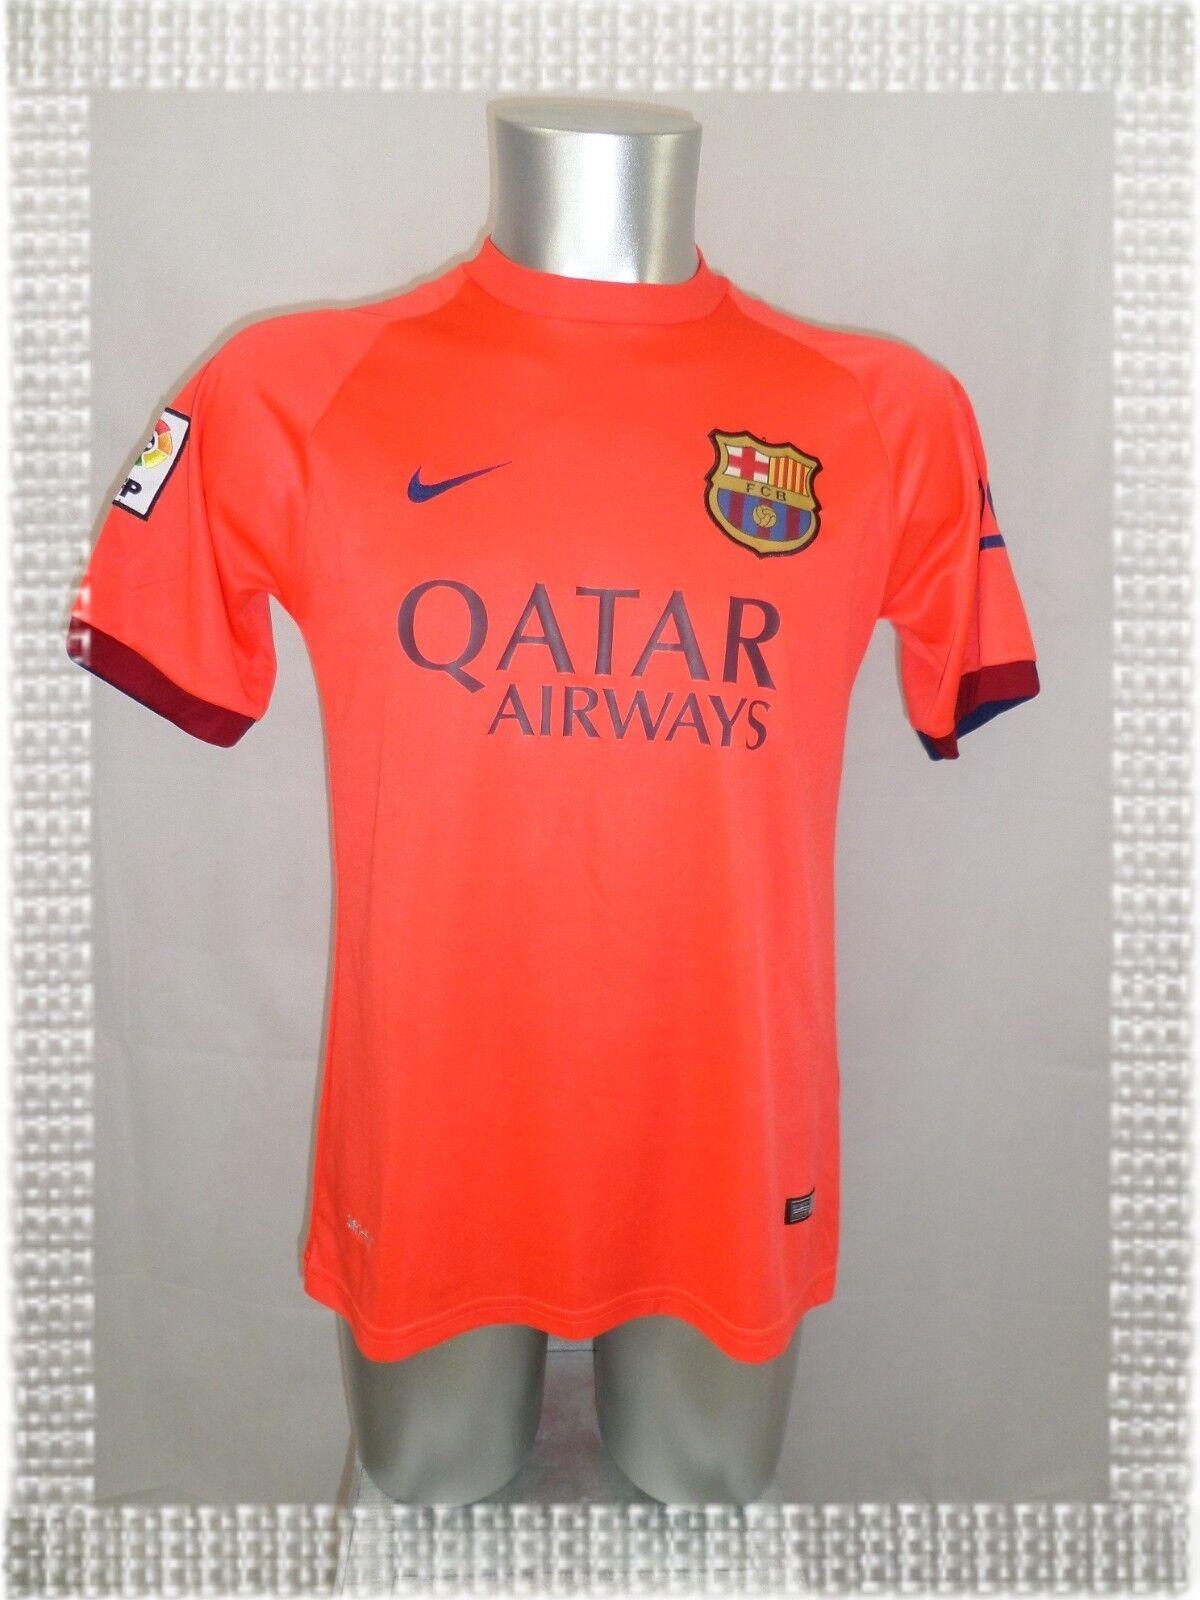 A - Maillot Foot FC Barcelone Nike naranja  Fluo Qatar Airways N° 31 Munir T-XL